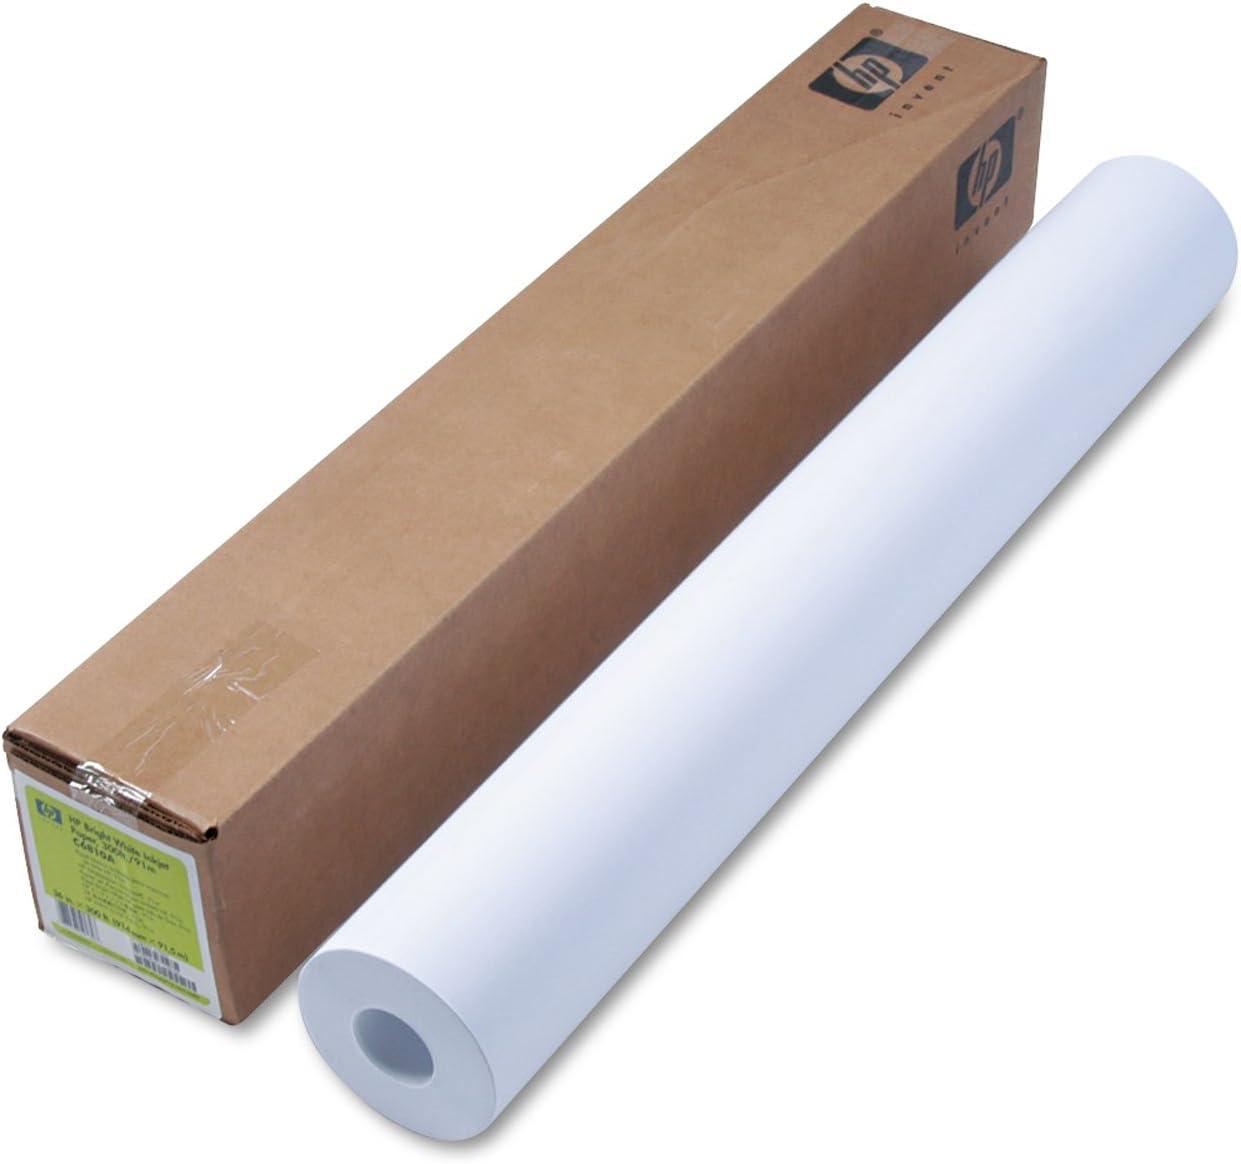 "HP Bond Paper 36"" x 300 ft - 24 lb Basis Weight - Matte - 95 Brightness - 1 / Roll - White"